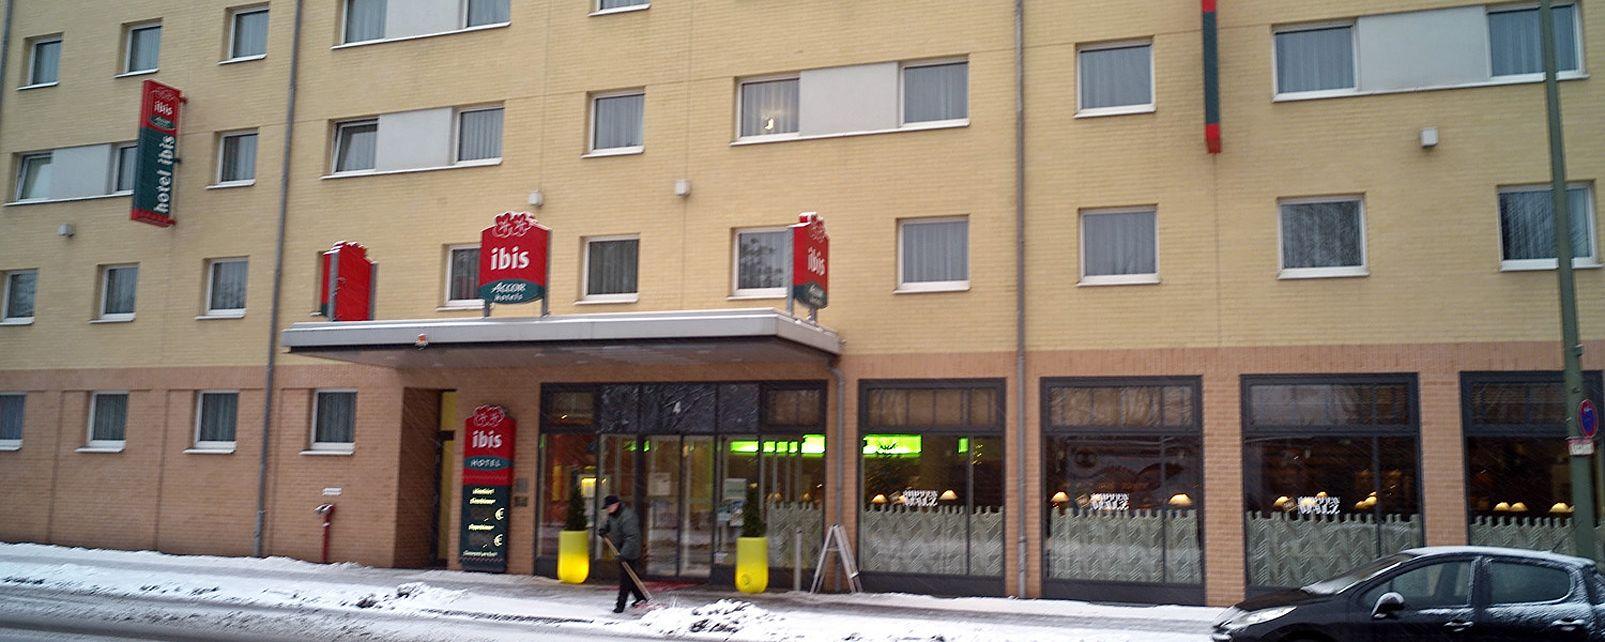 Hotel Ibis Berlin Potsdamer Platz